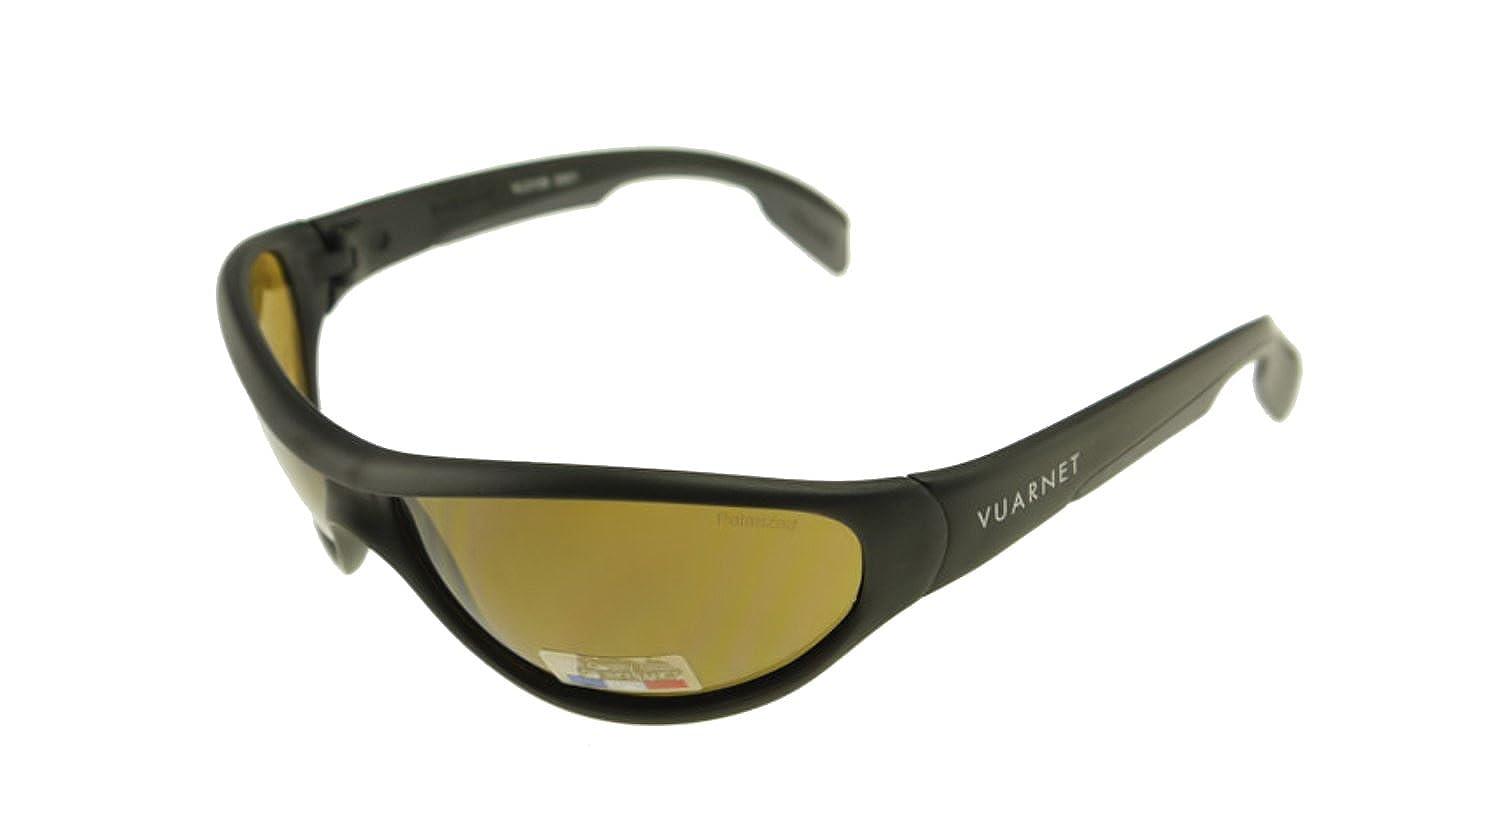 b23b5ce7f2 Amazon.com  Vuarnet Matte Black   Polarized Brown PC 2000 Sunglasses VL  0109 0001  Clothing